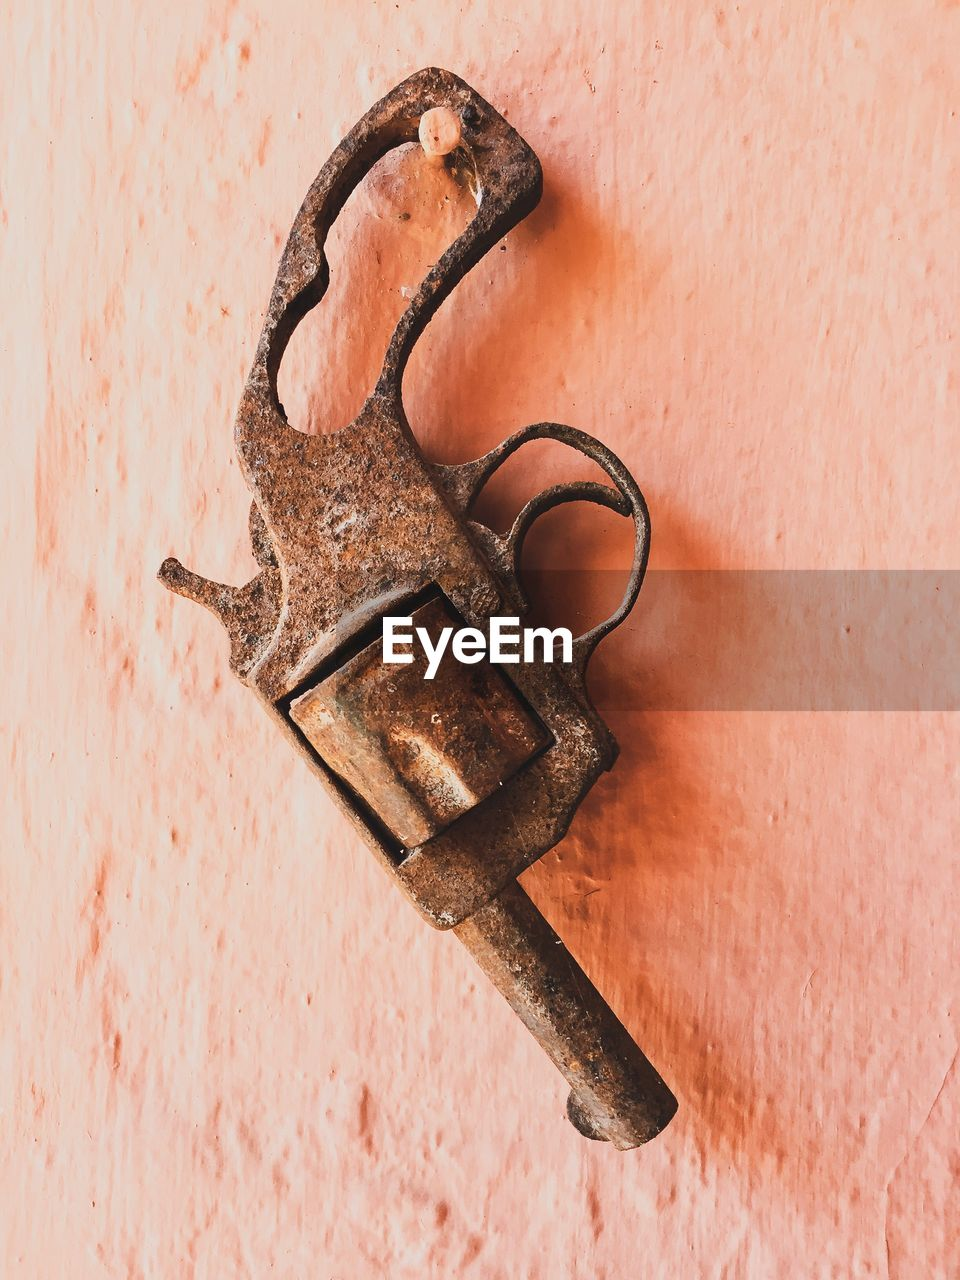 Close-up of rusty gun on wall